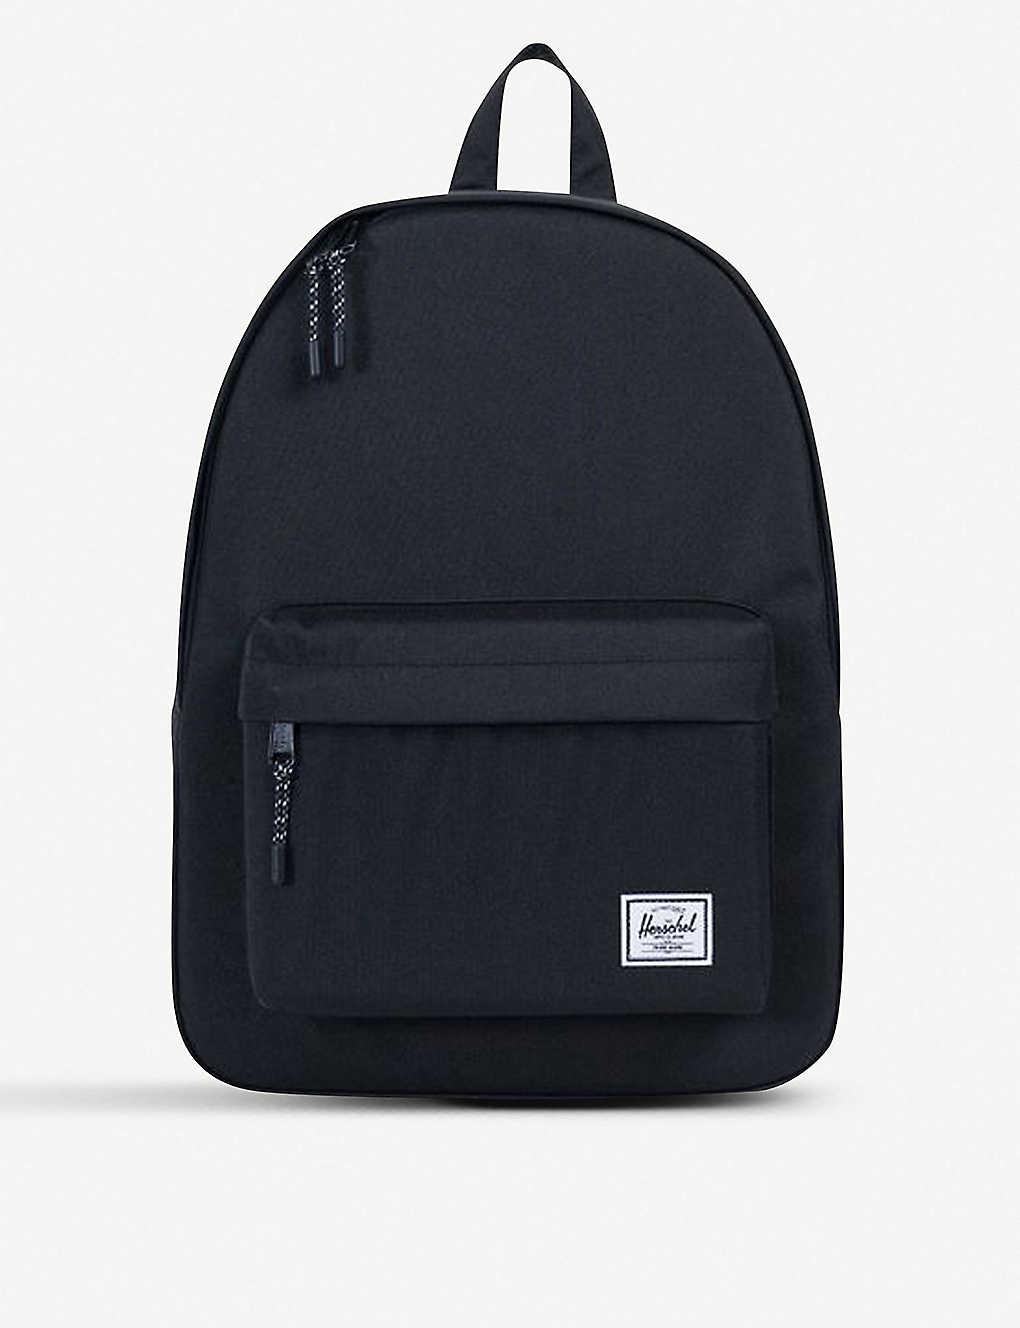 f83c1e25e4 HERSCHEL SUPPLY CO - Classic backpack